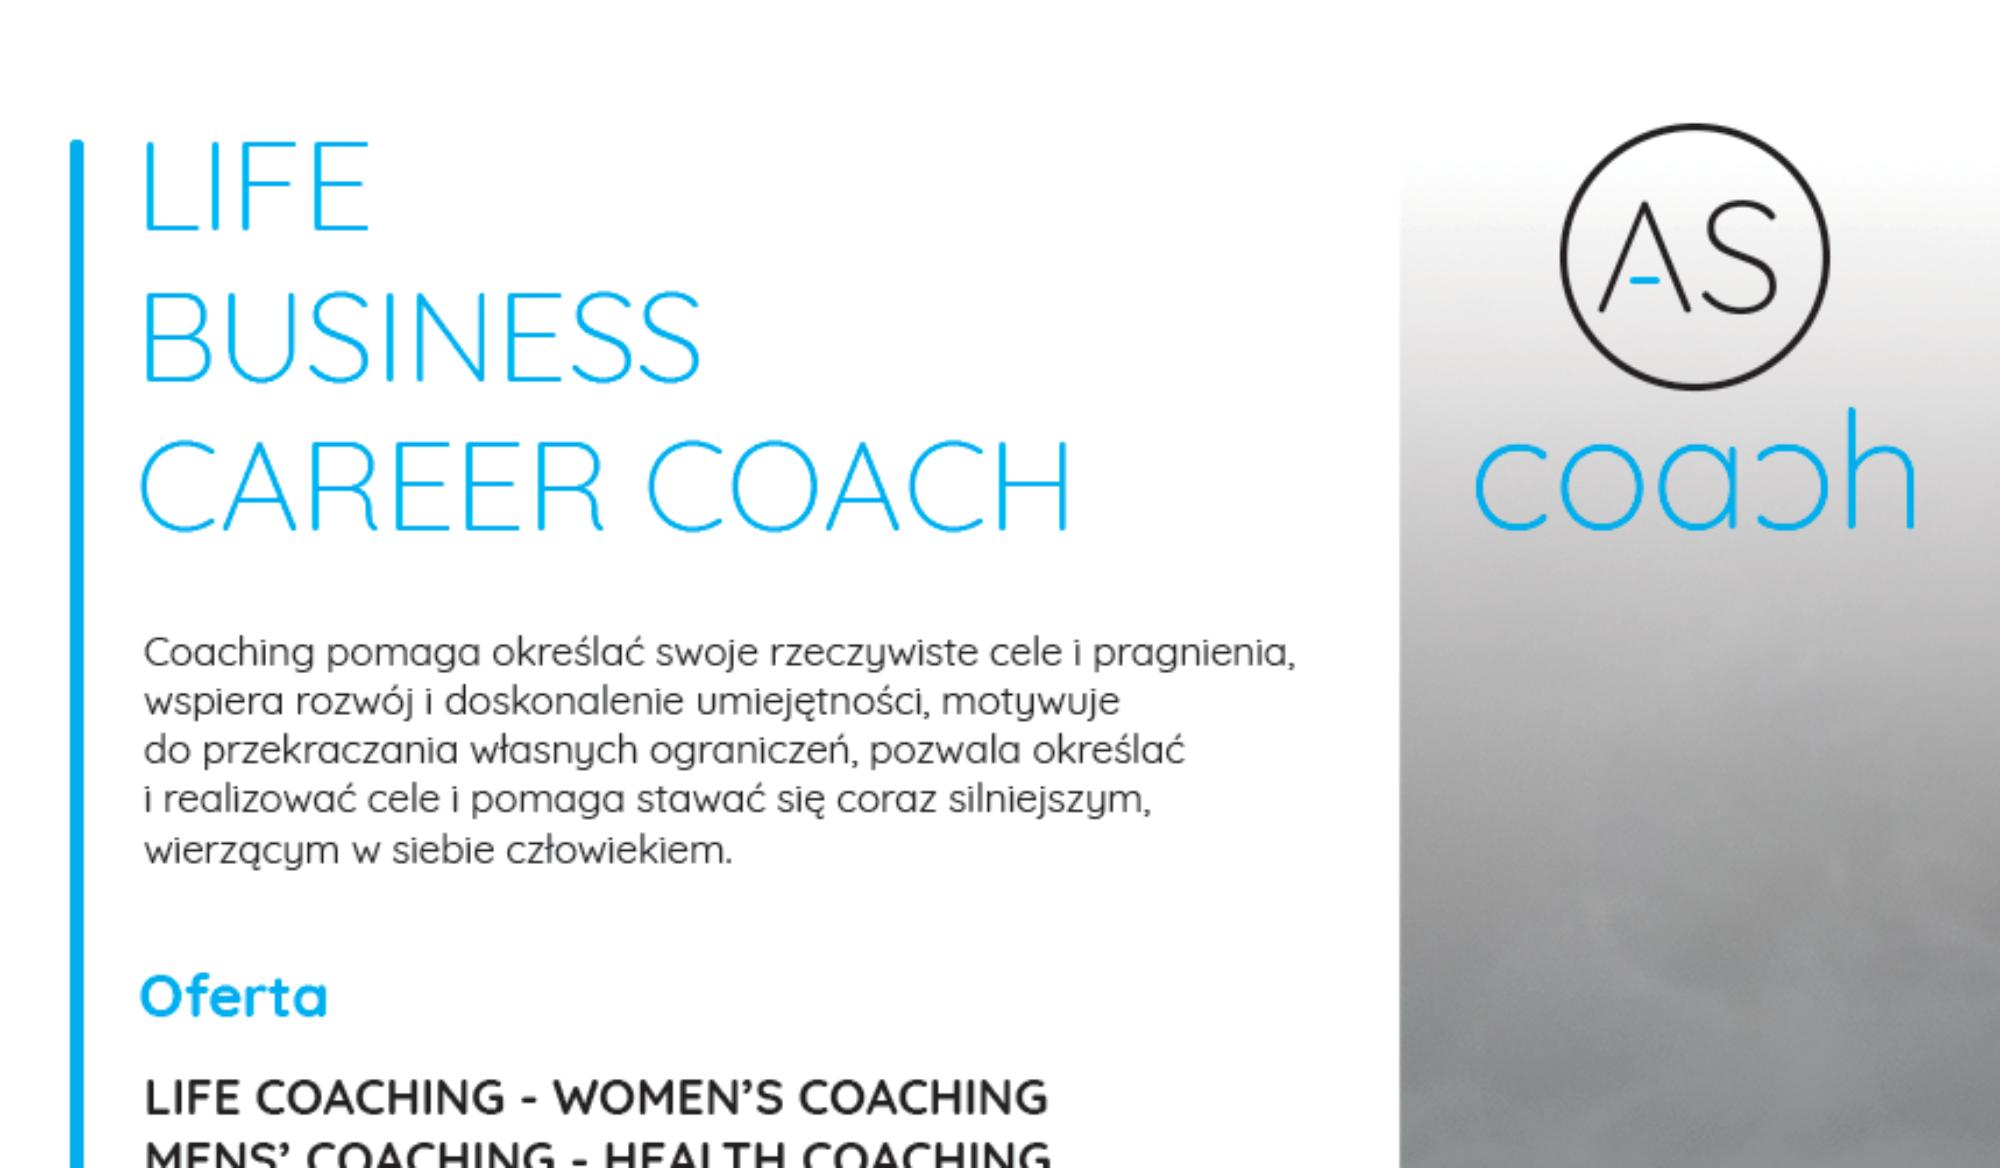 Life & Business & Career Coach Agnieszka Śliwka